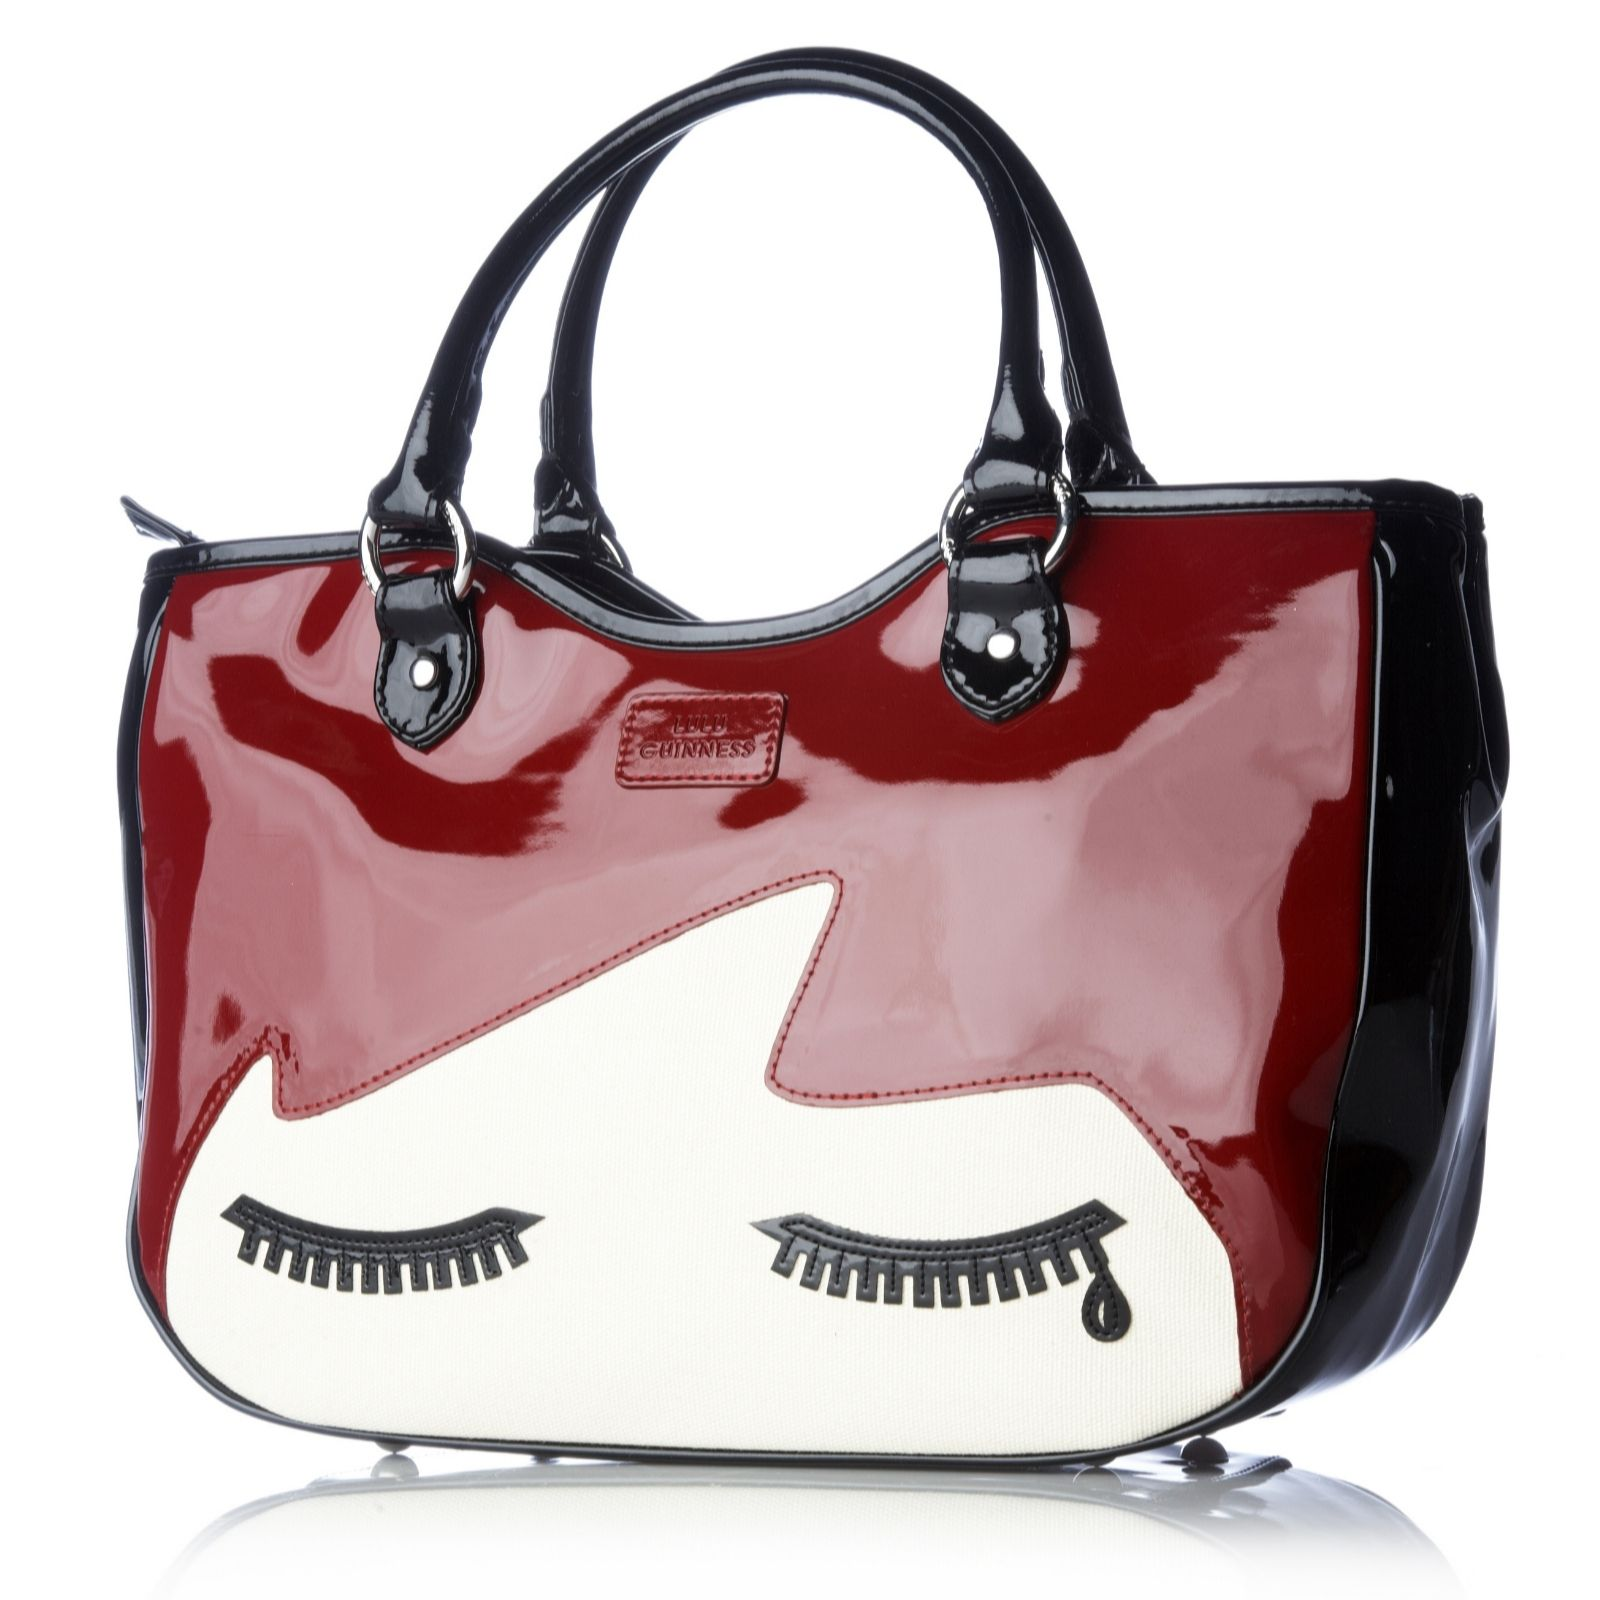 0f6429c7d55 Lulu Guinness Doll Face Wanda Bag - QVC UK